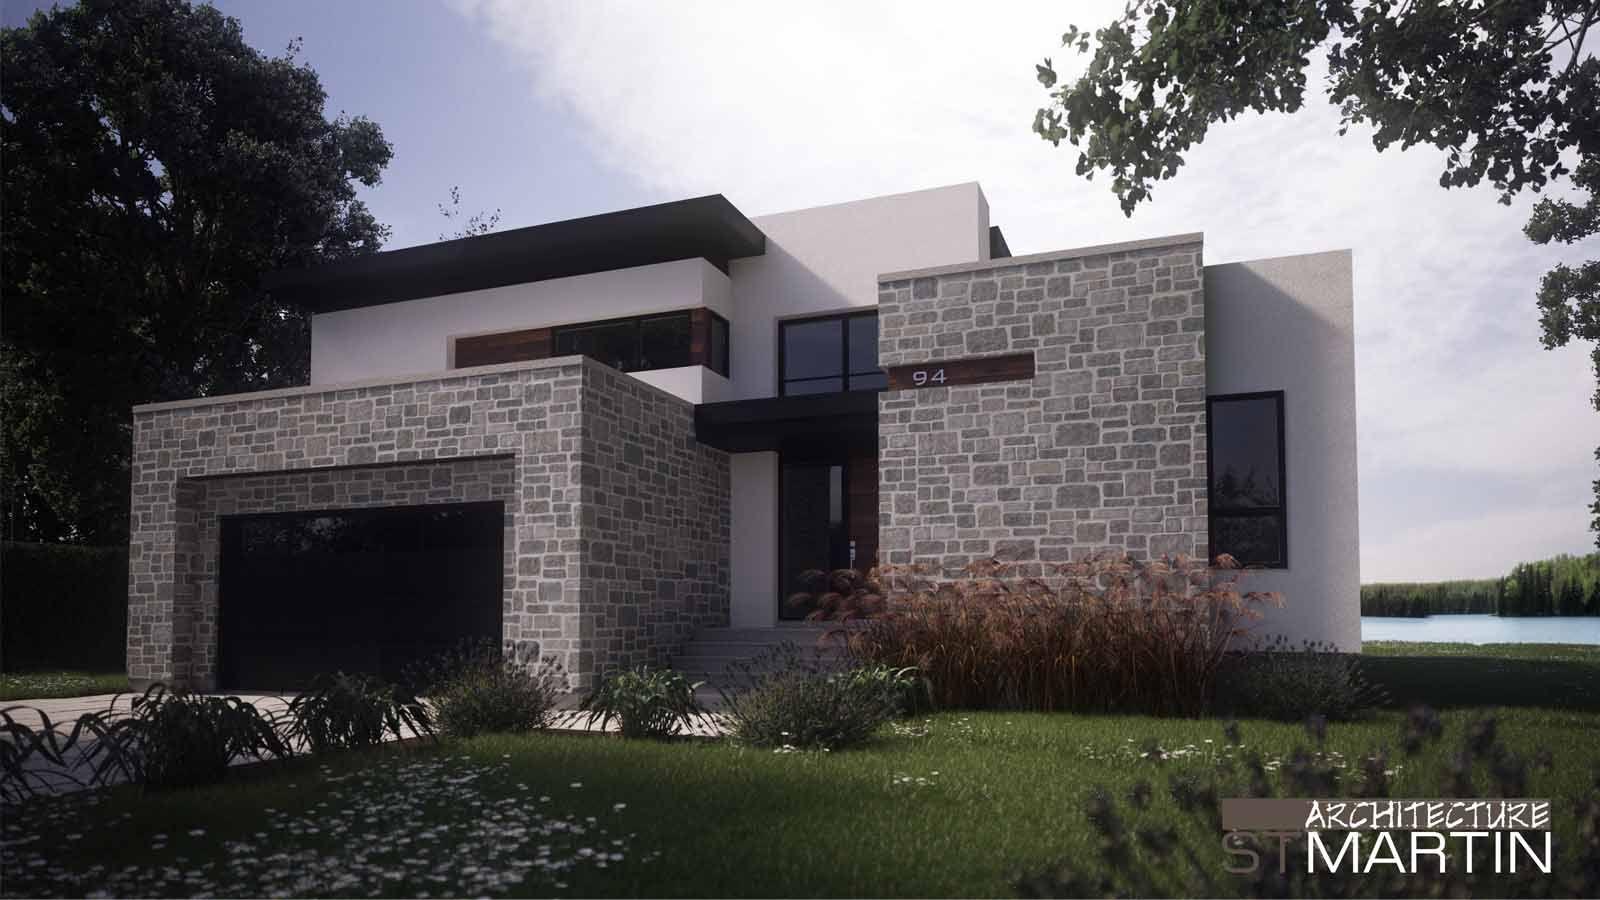 architecture st martin maisons neuves design maisons. Black Bedroom Furniture Sets. Home Design Ideas